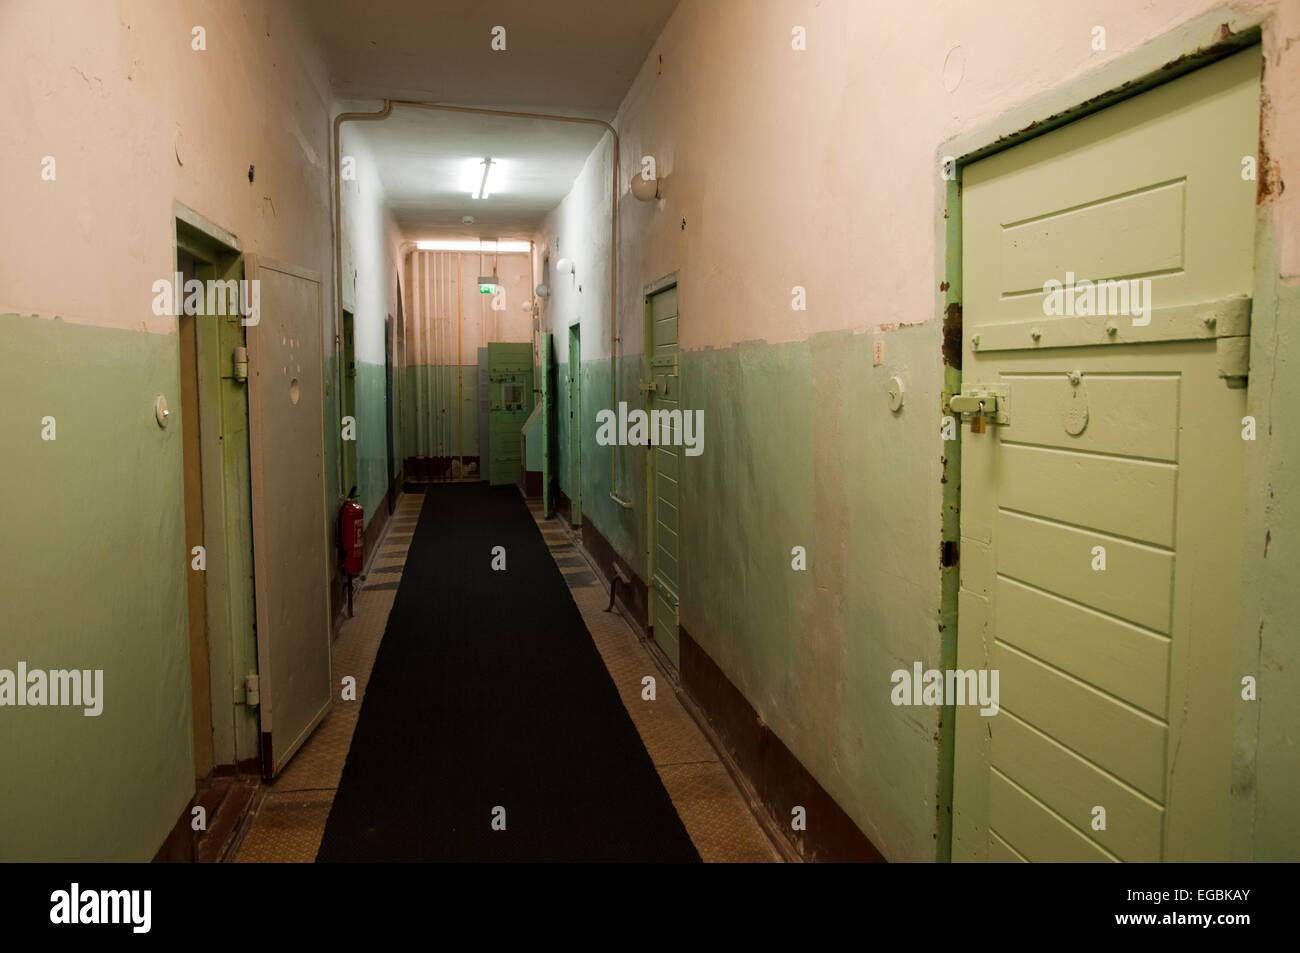 Former Soviet KGB prison, Leistikowstrasse, Potsdam, Germany - Stock Image